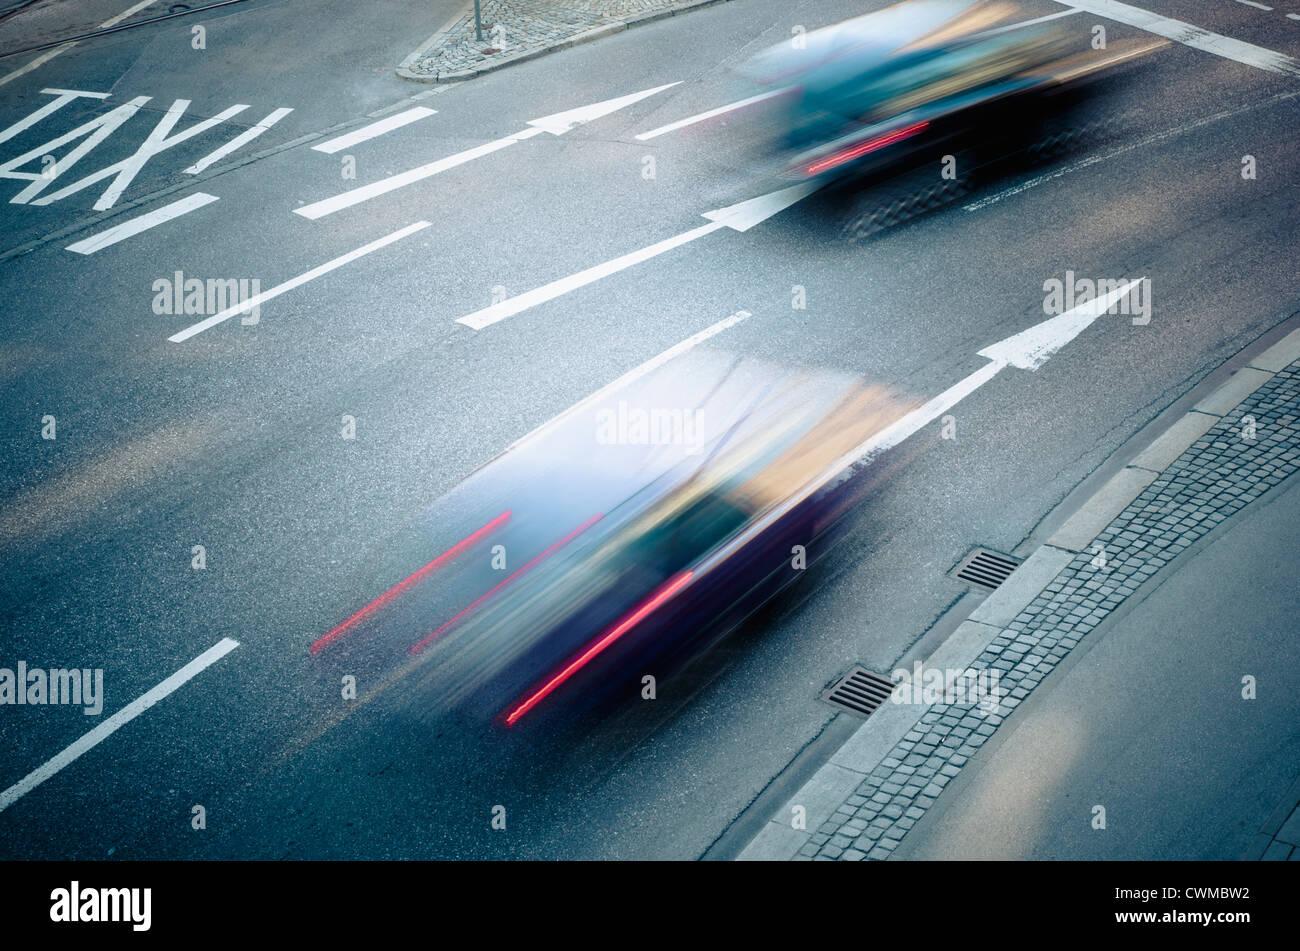 Germany, Bavaria, Munich, Traffic on road - Stock Image